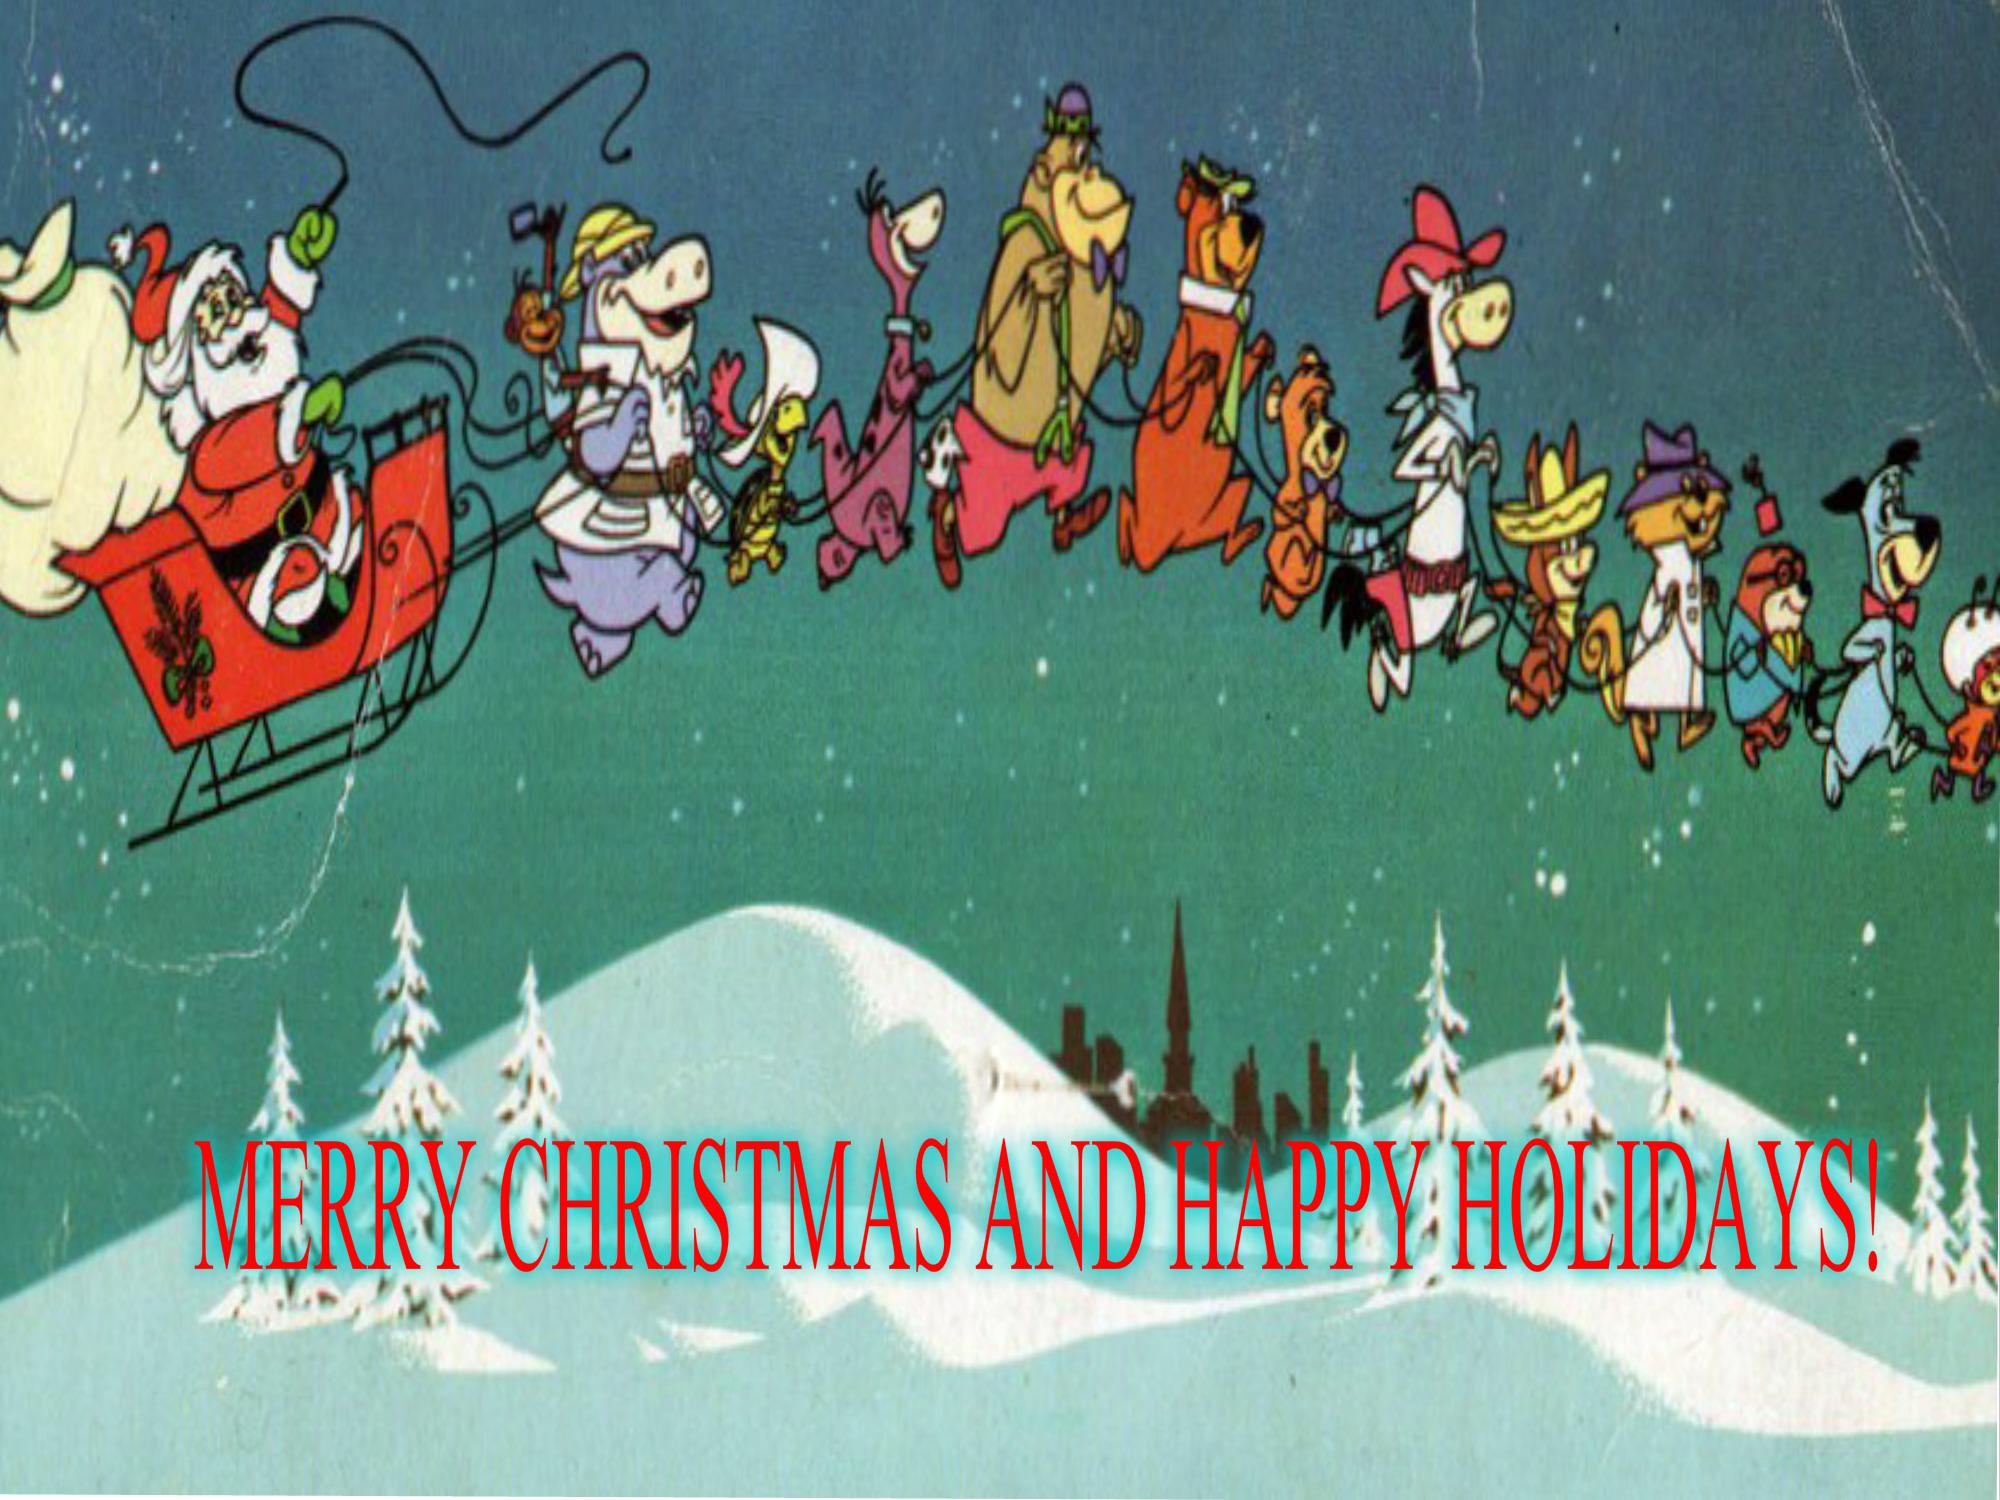 hanna barbera christmas holiday cheer blogspot stuff hub ideas wiki fandom hanna barbera christmas holiday cheer